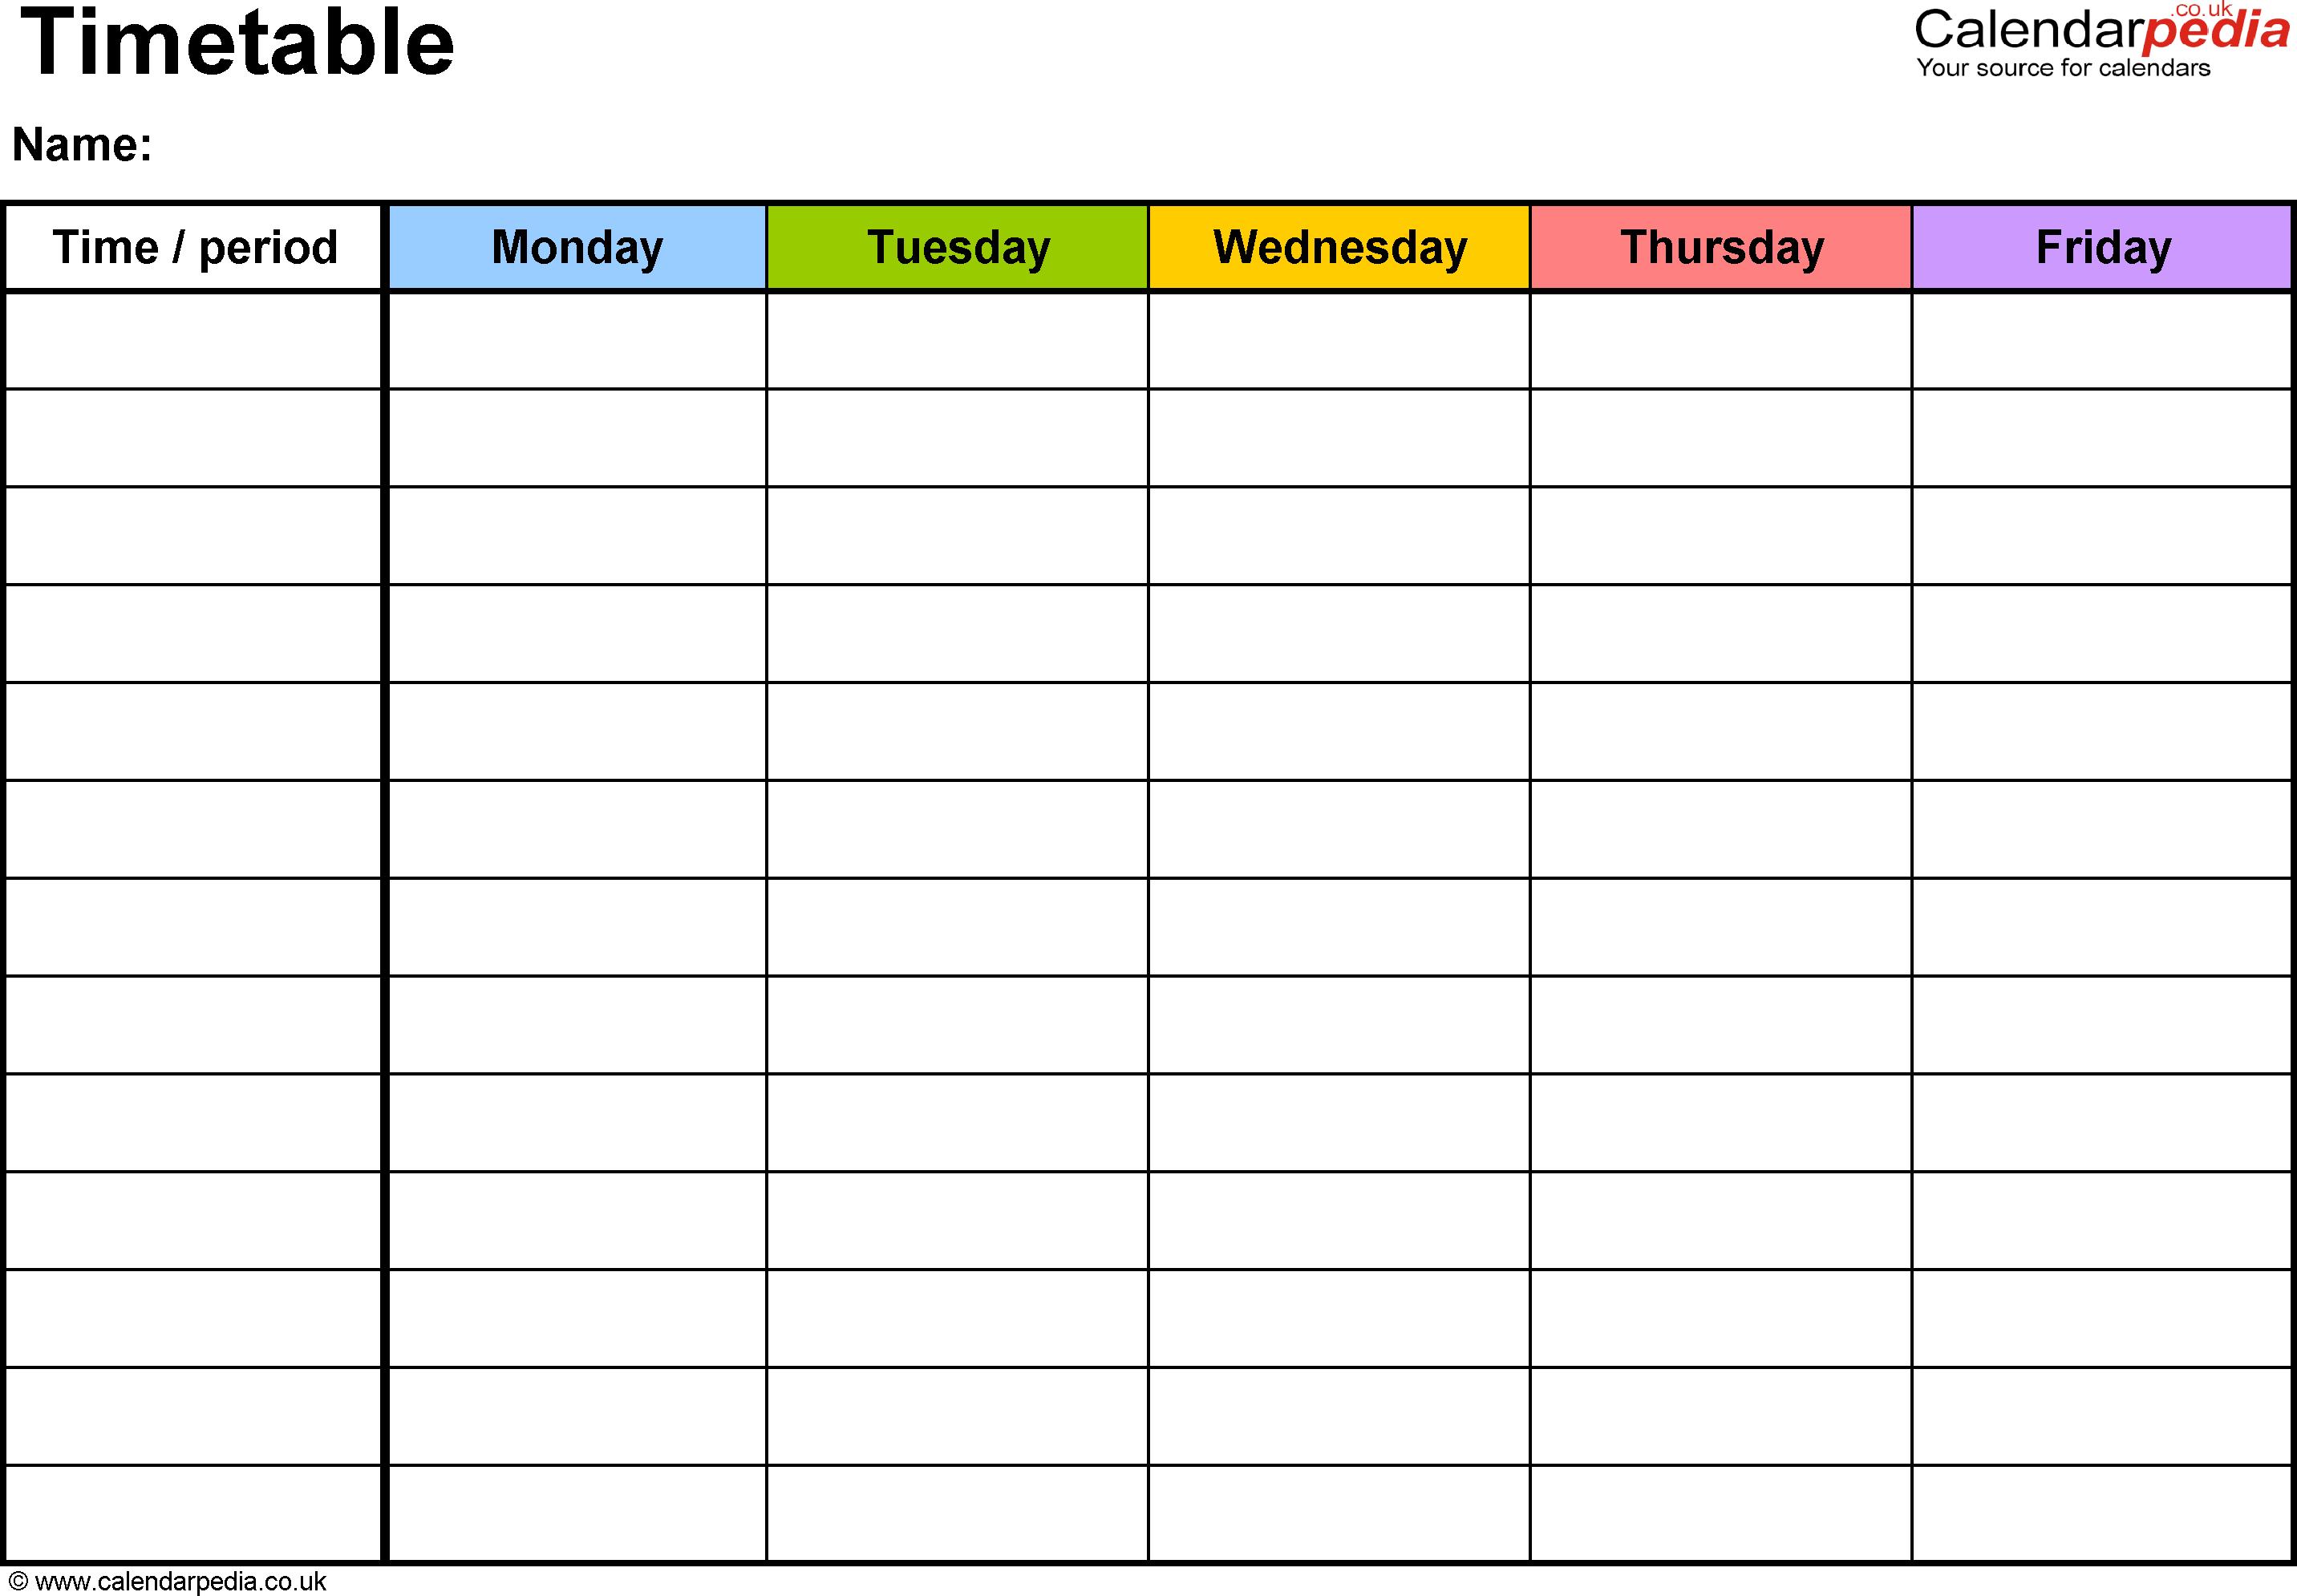 Times tables chart a4 pdf